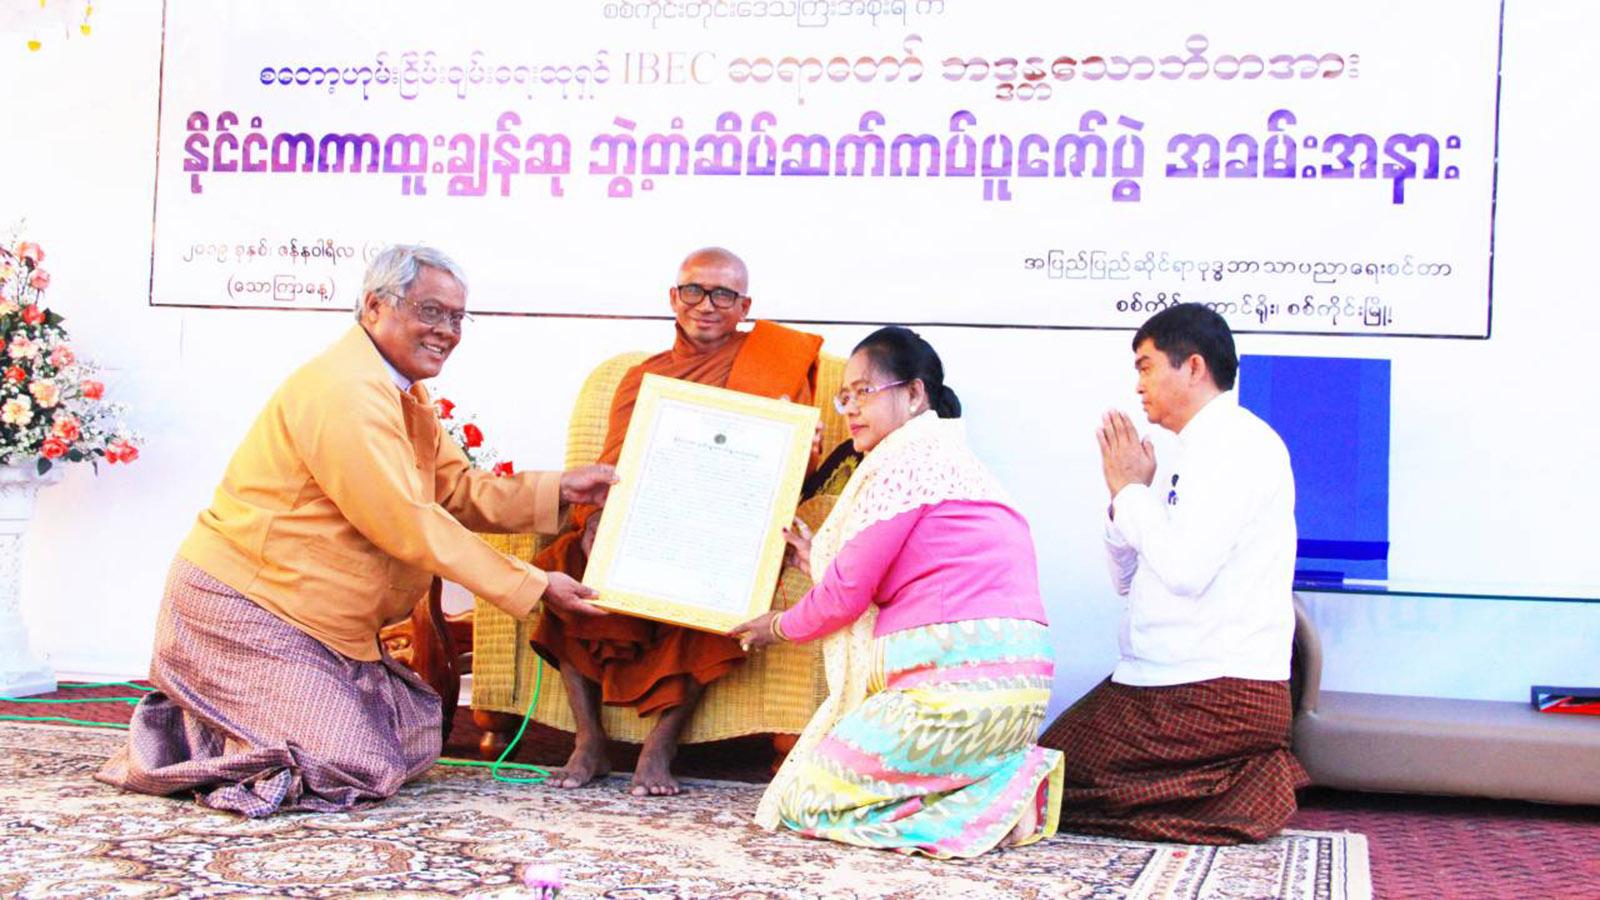 Sagaing Region Chief Minister and officials presents the award to the Sayadaw Bhaddanta Sobita.Photo: Aung San Maung